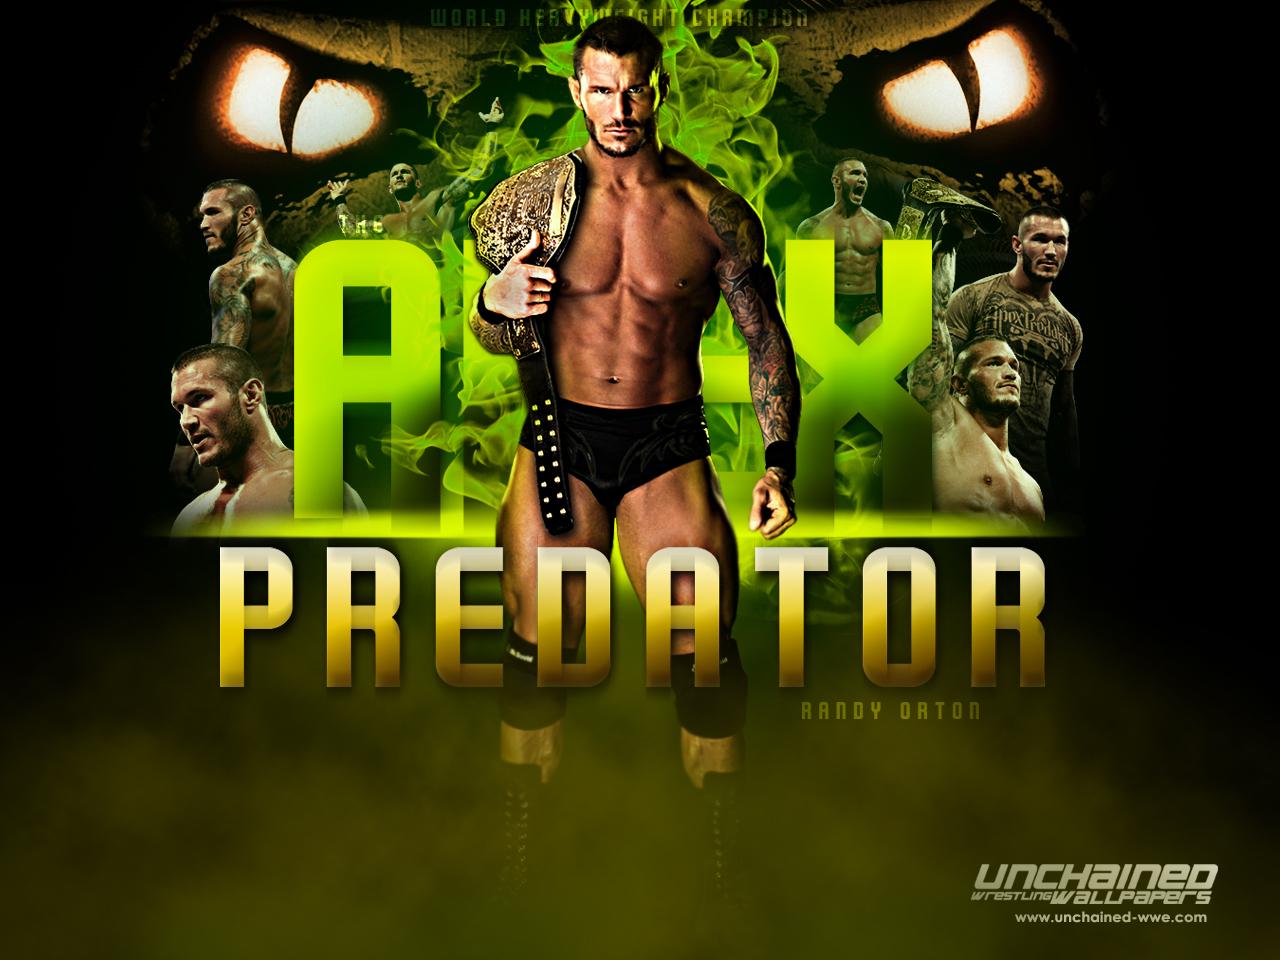 Randy Orton 1280x960